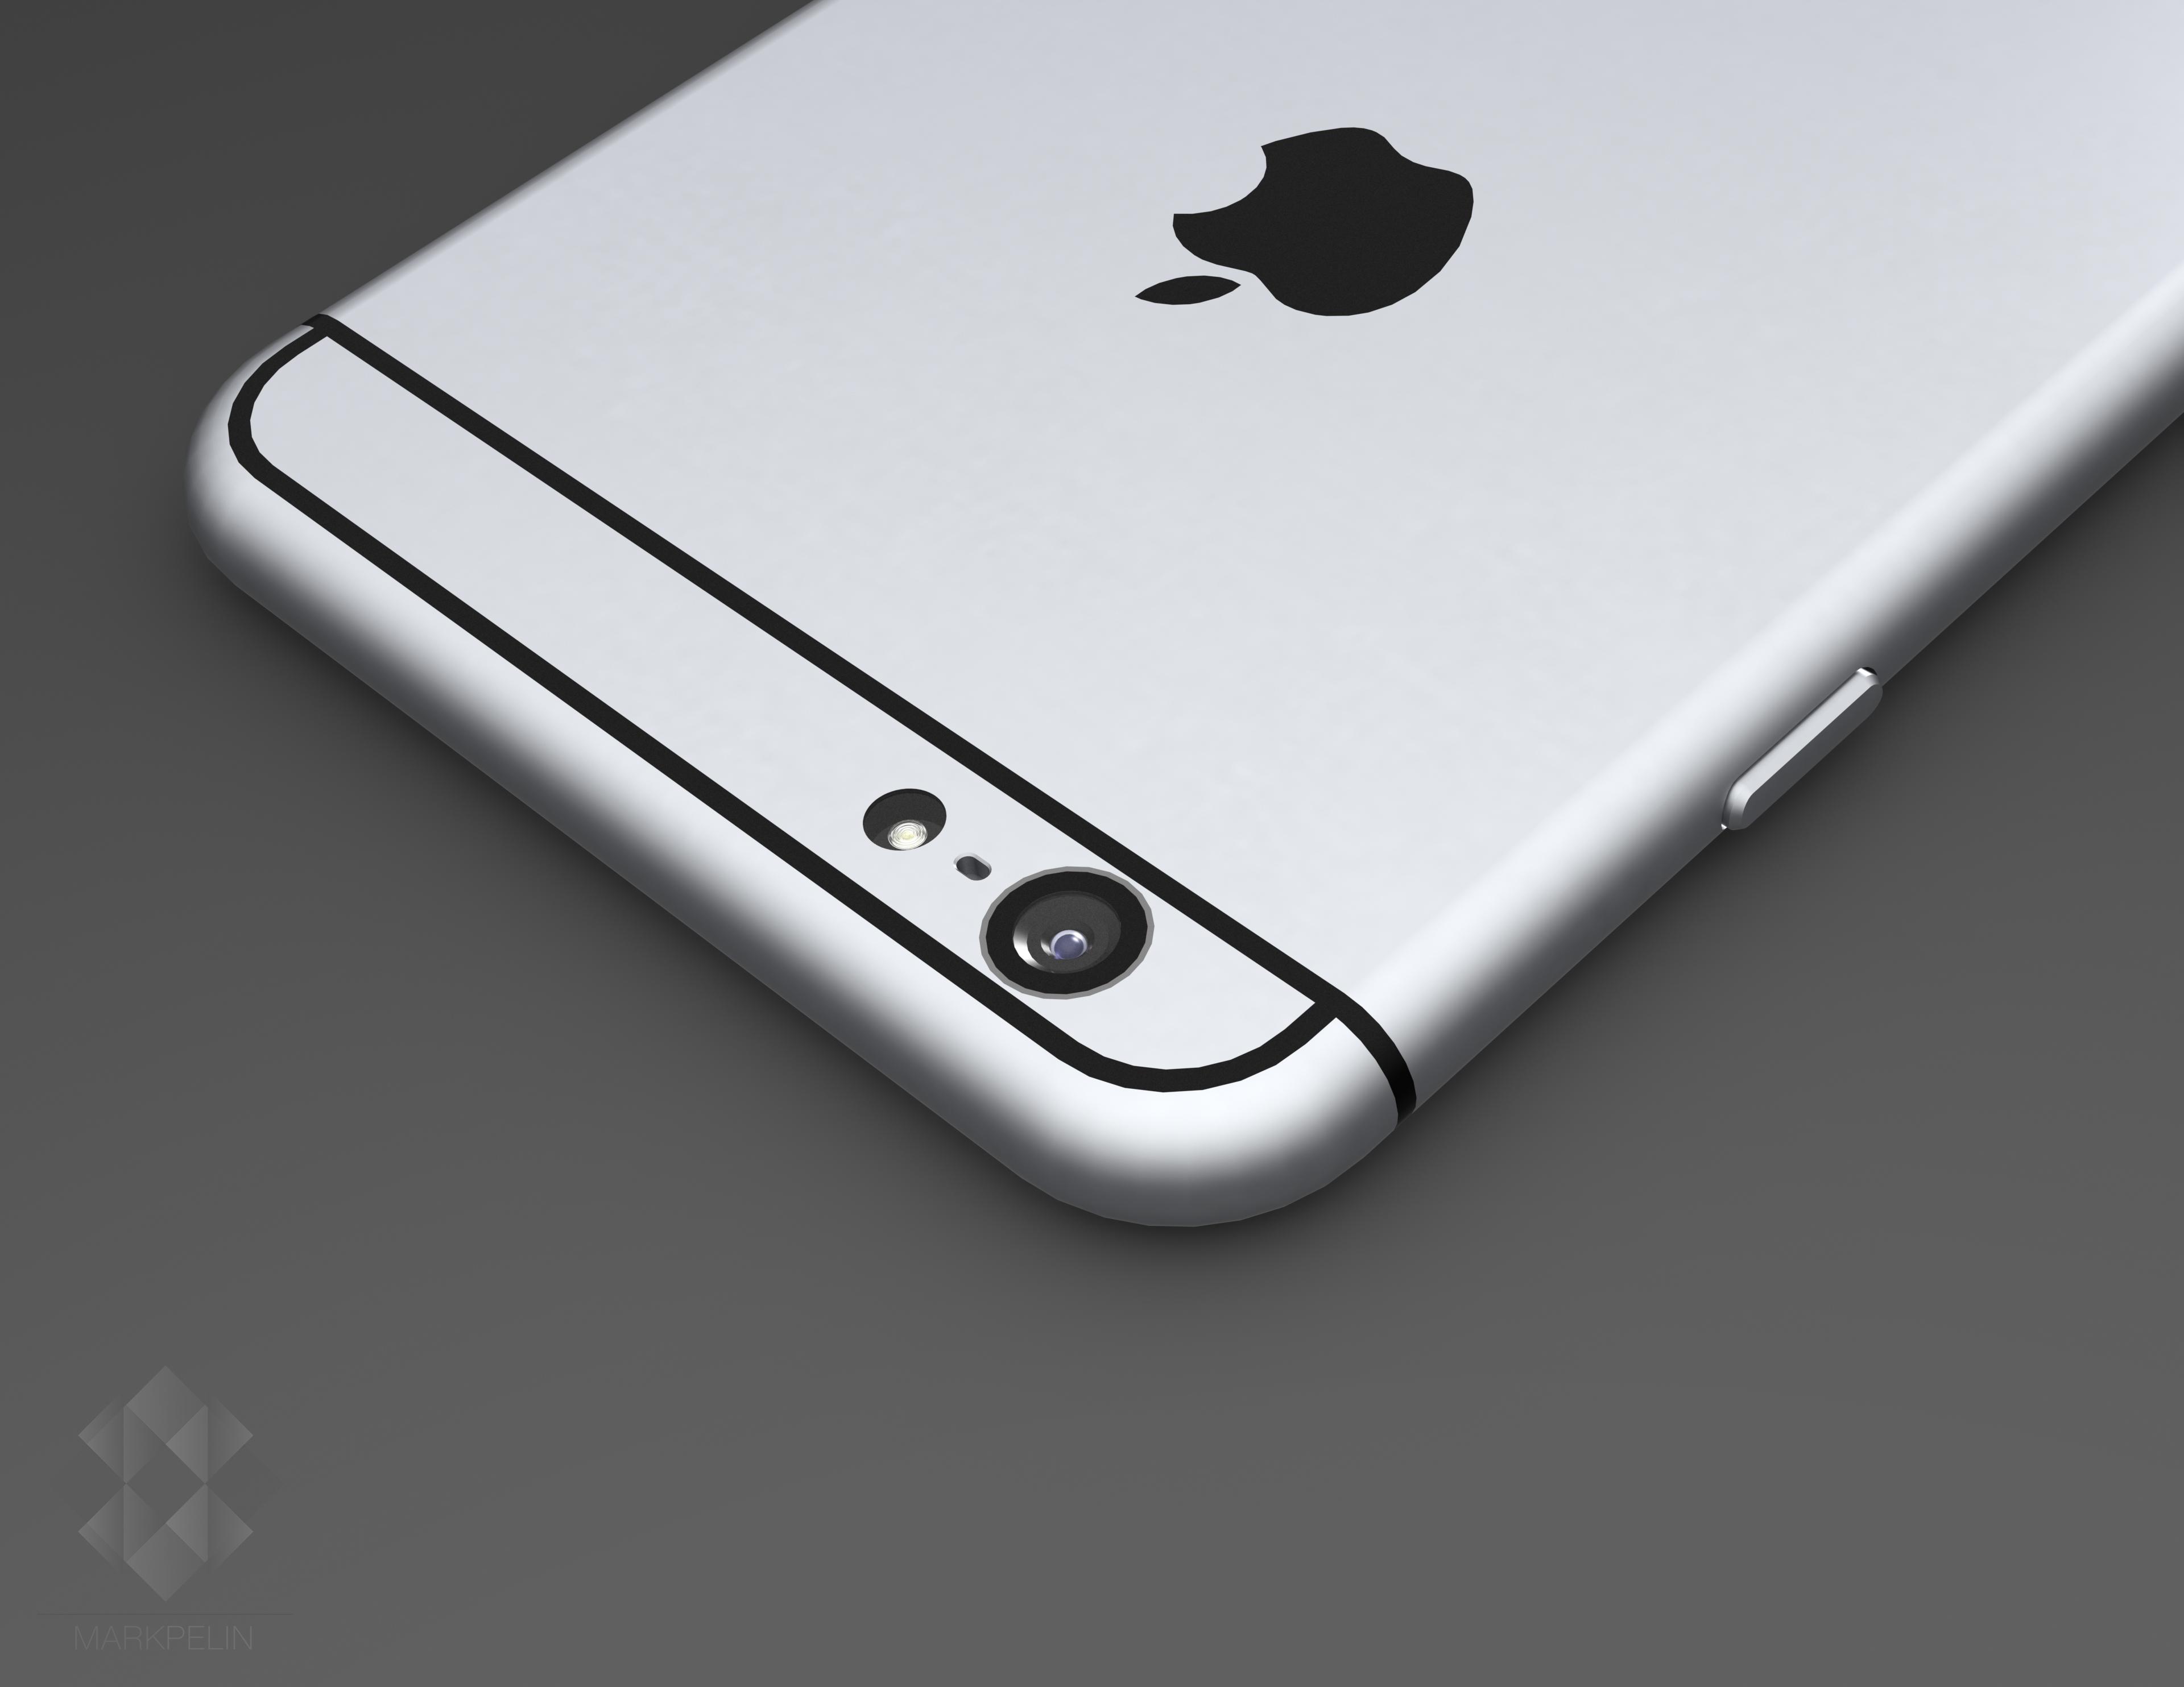 data_rumor_1404347034_9mp_iphone6_render_backdetails